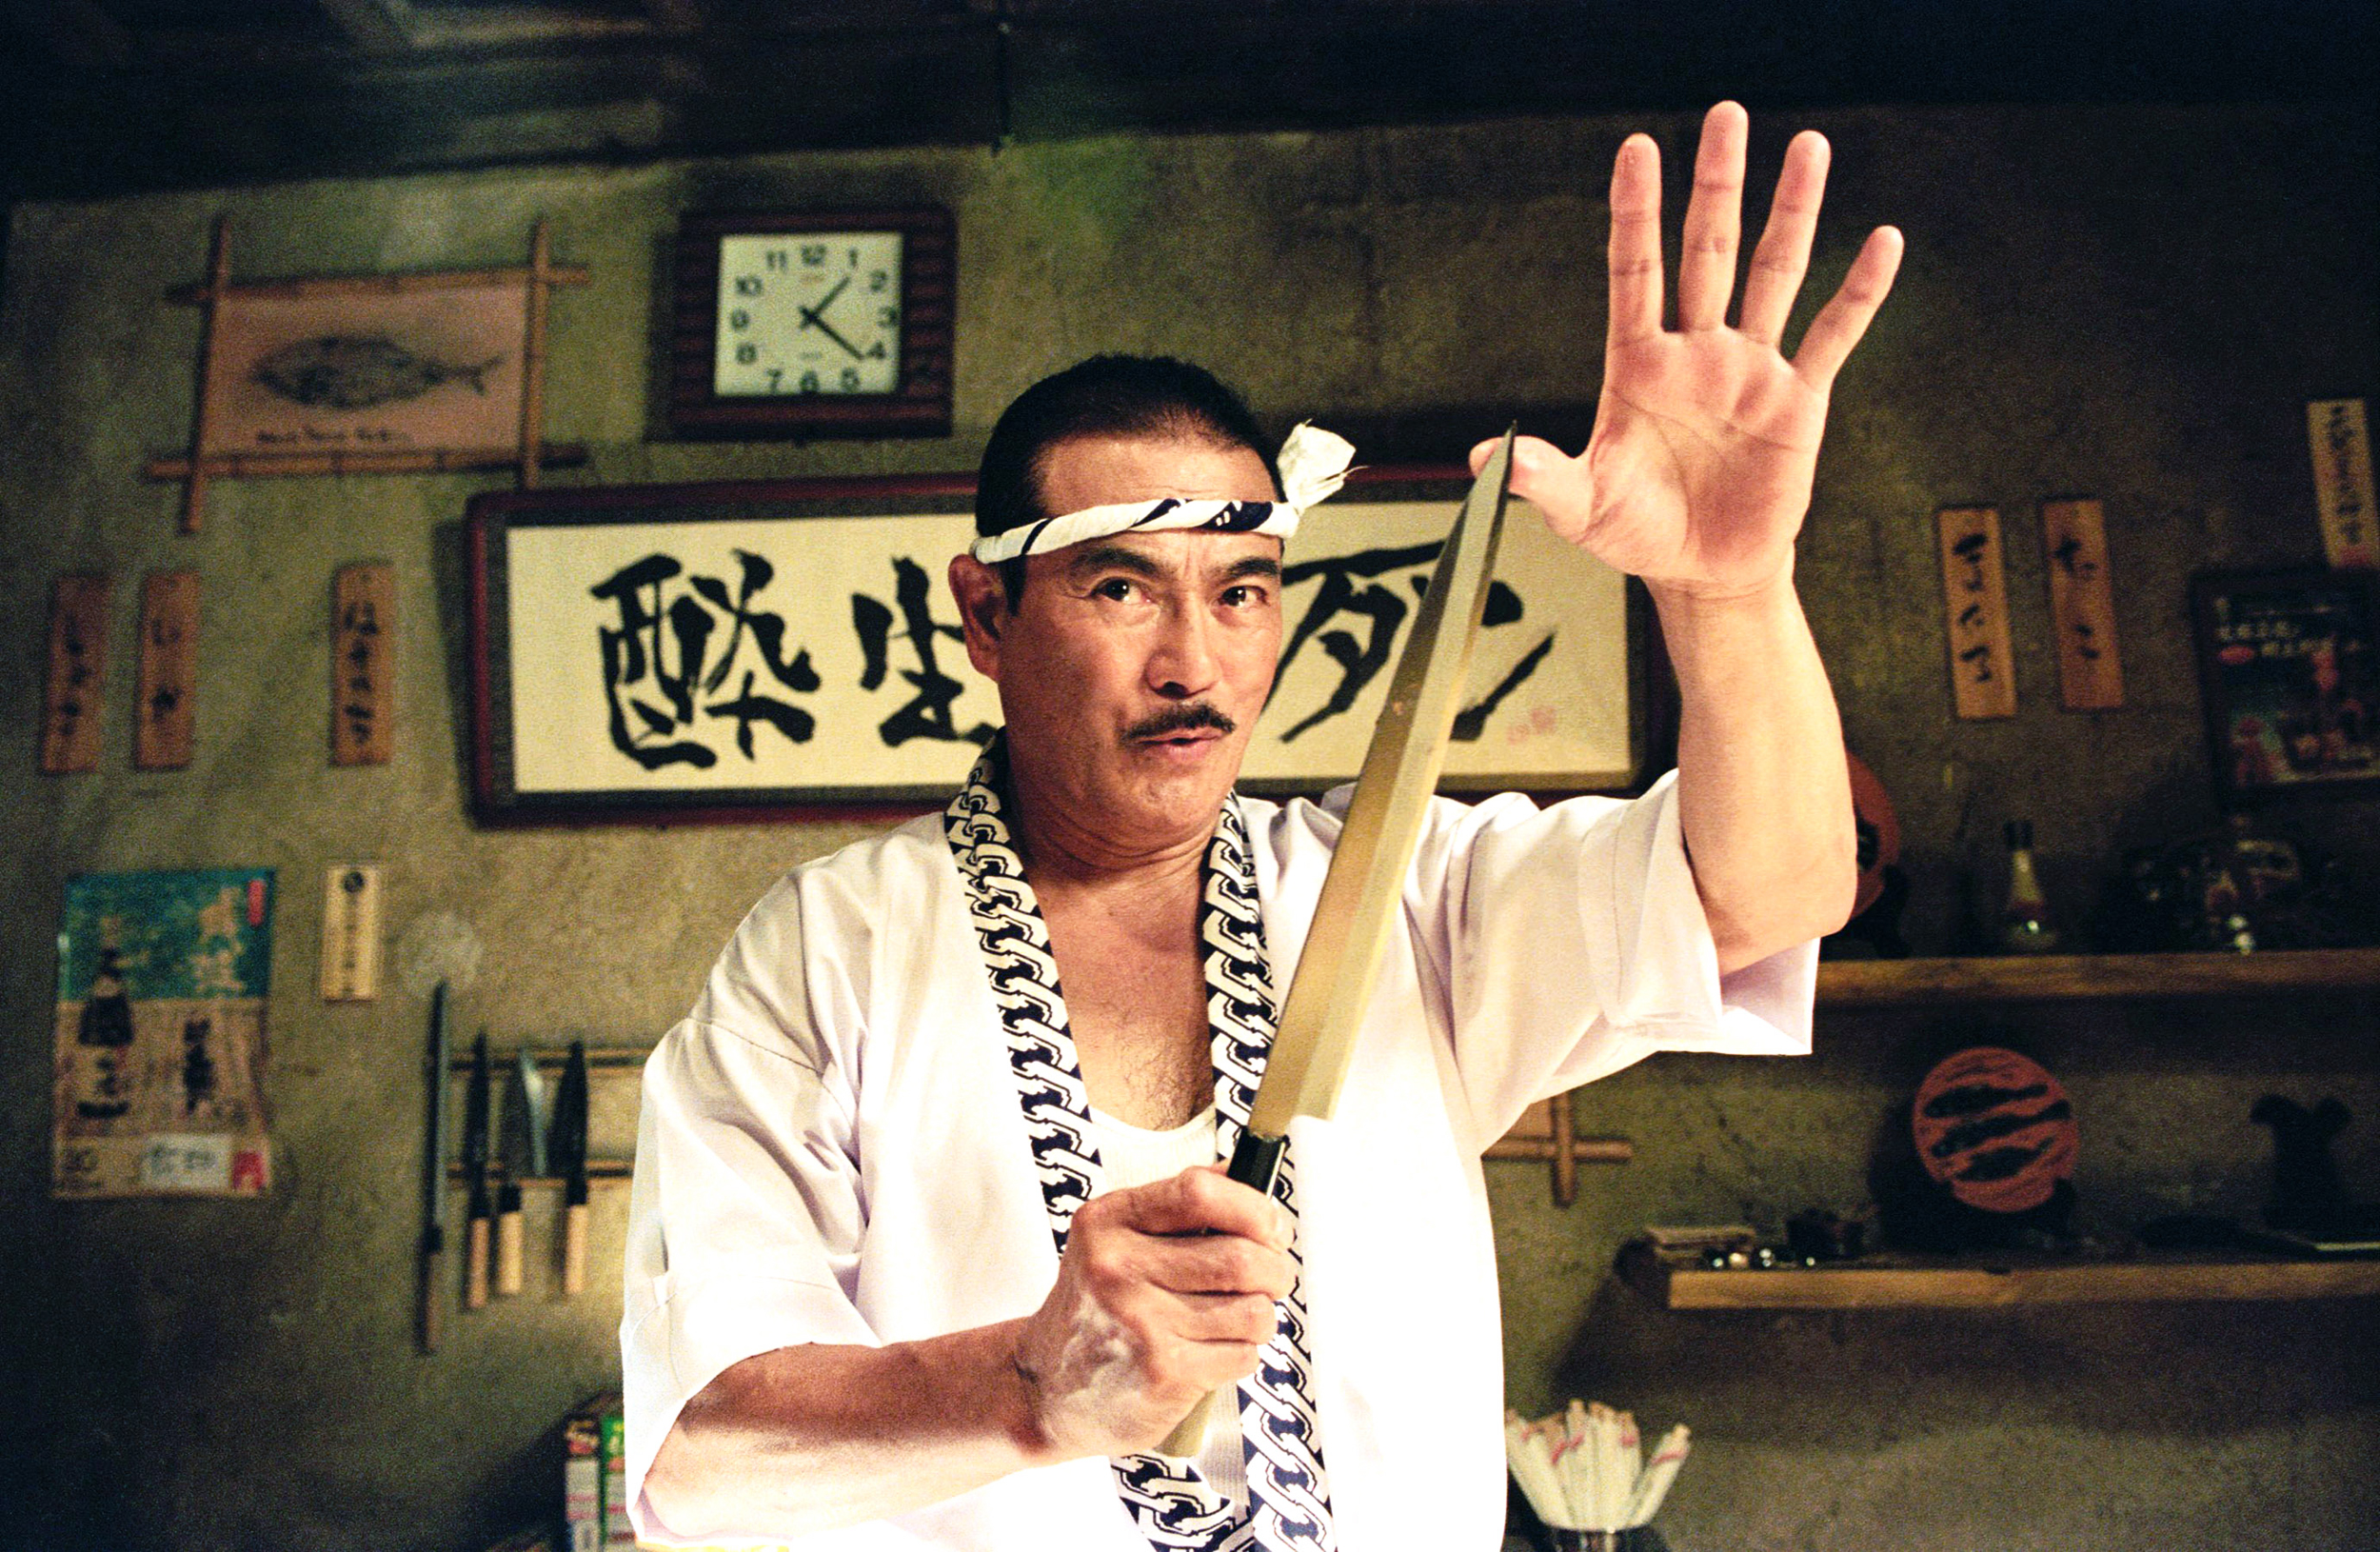 Sonny Chiba, 'Kill Bill' actor, dies at 82 of Covid complications